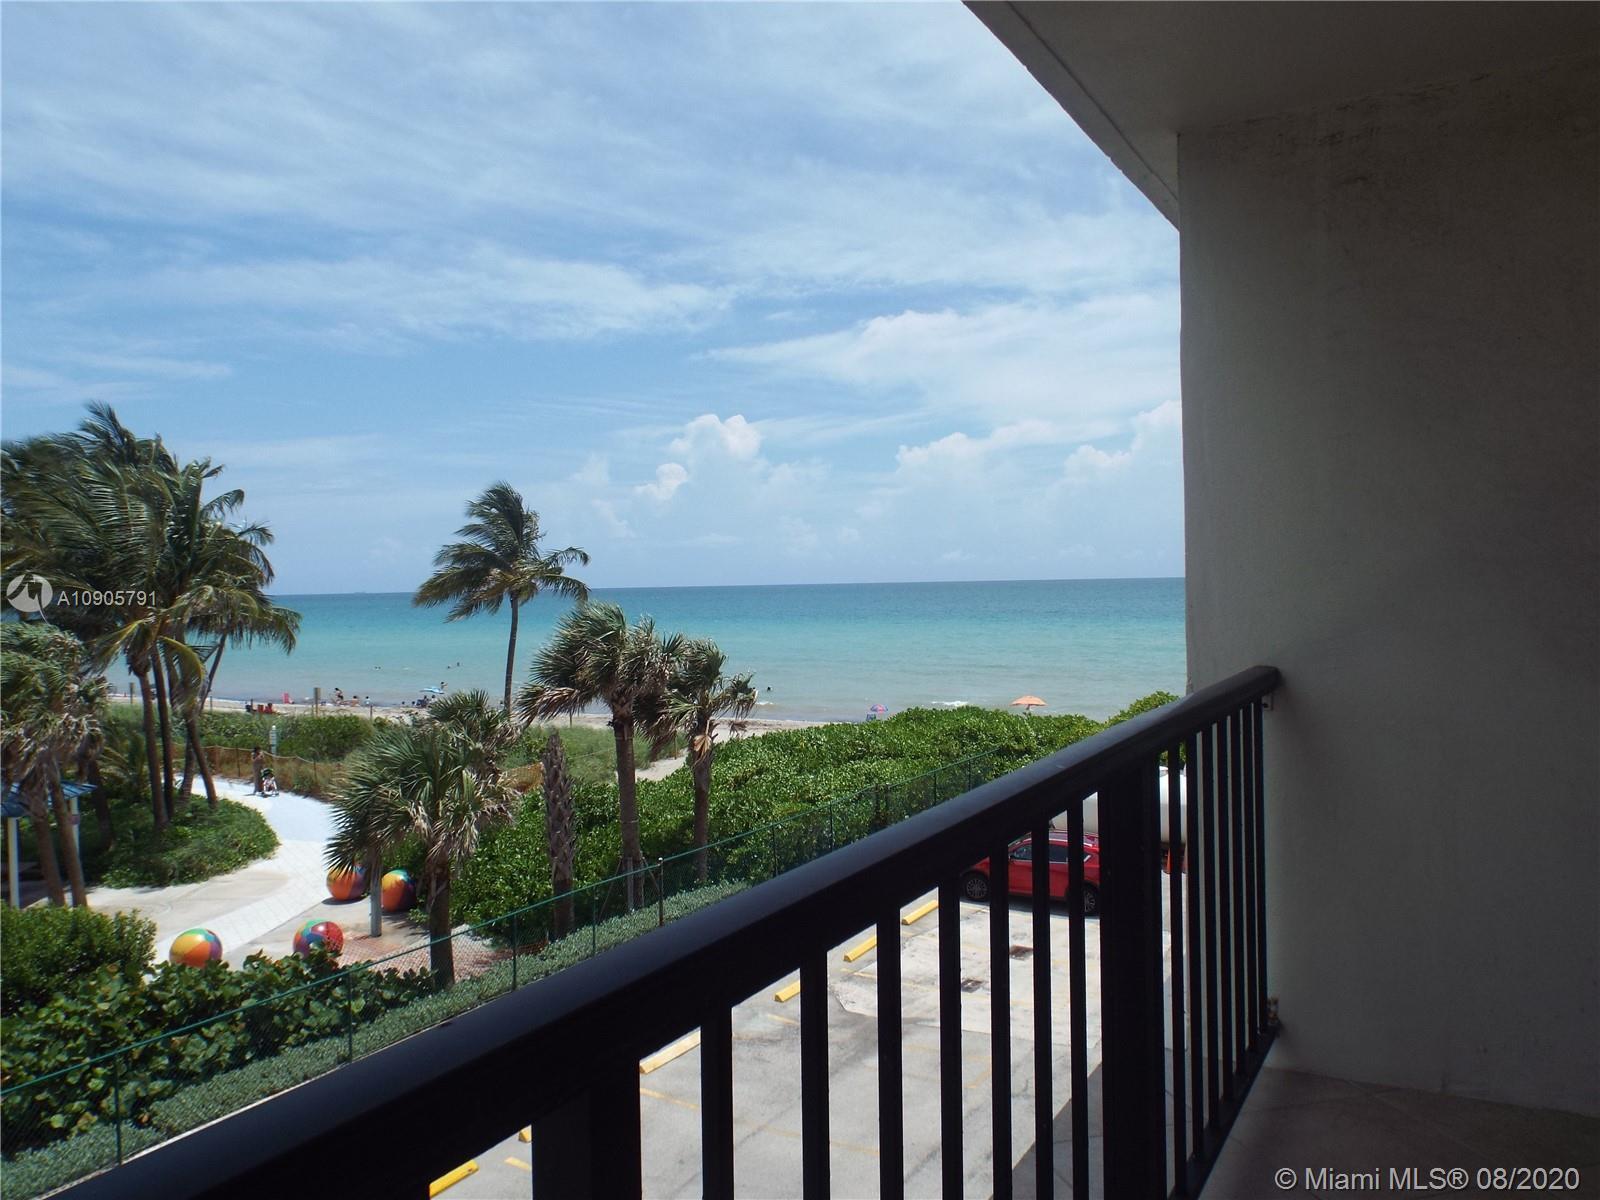 La Mer East #301 - 1890 S Ocean Dr #301, Hallandale Beach, FL 33009